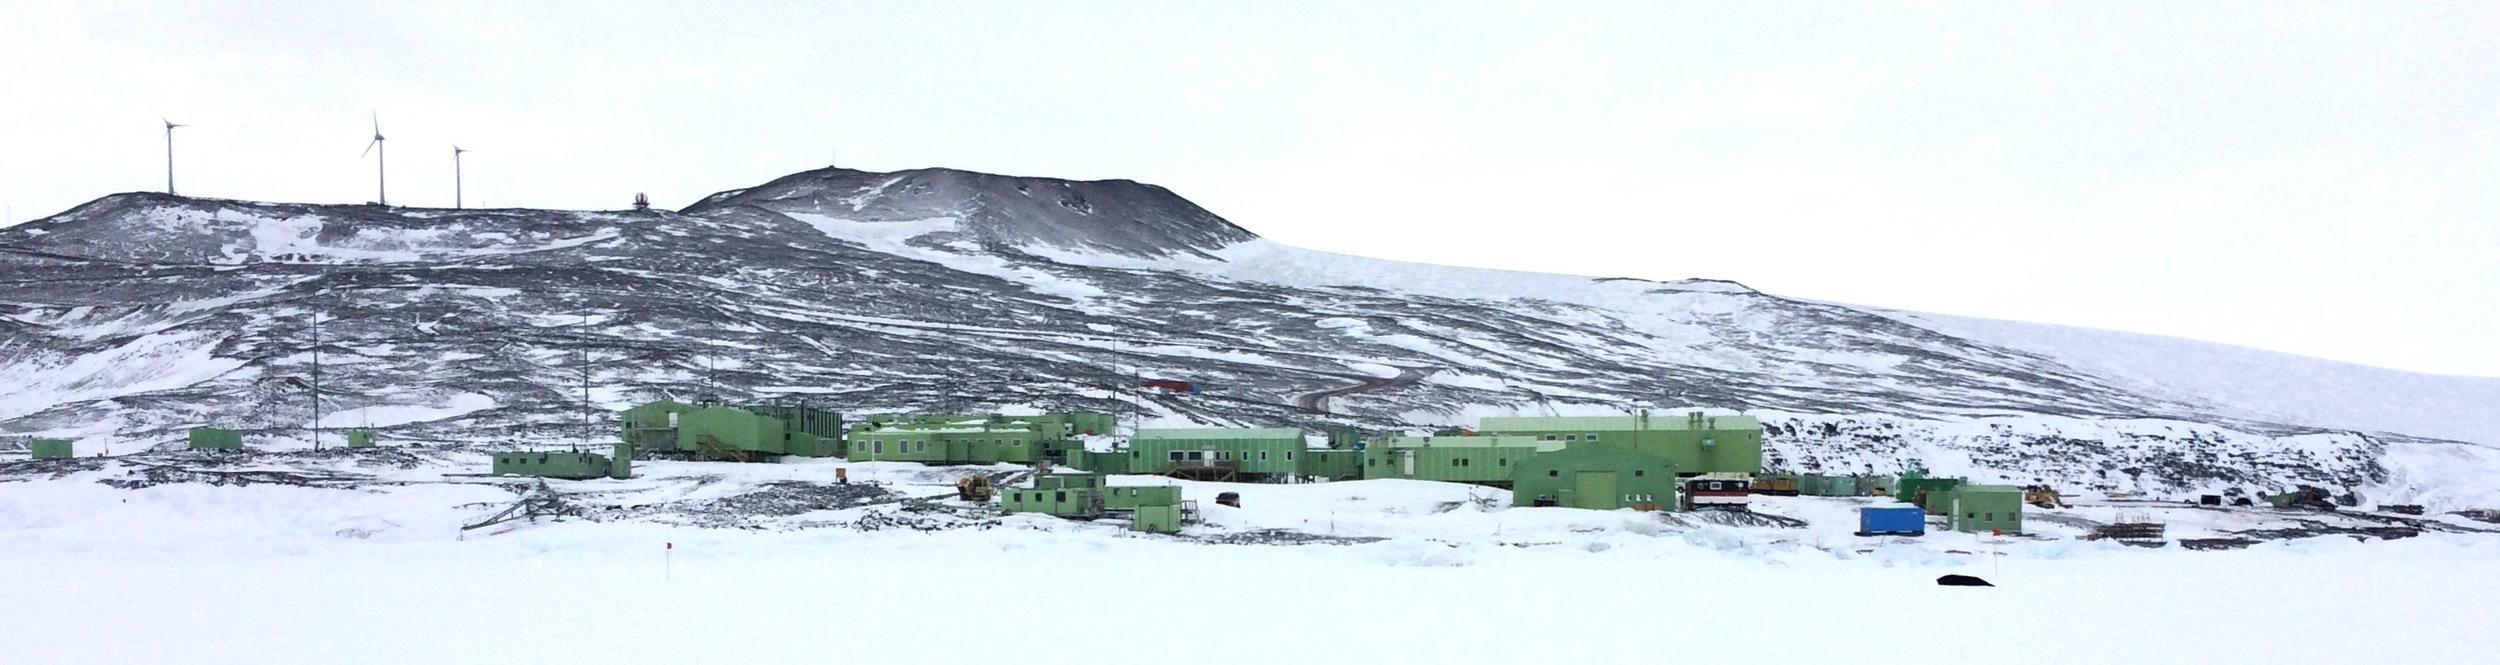 Not McMurdo Base, but the home of our Kiwi neighbors, Scott Base.